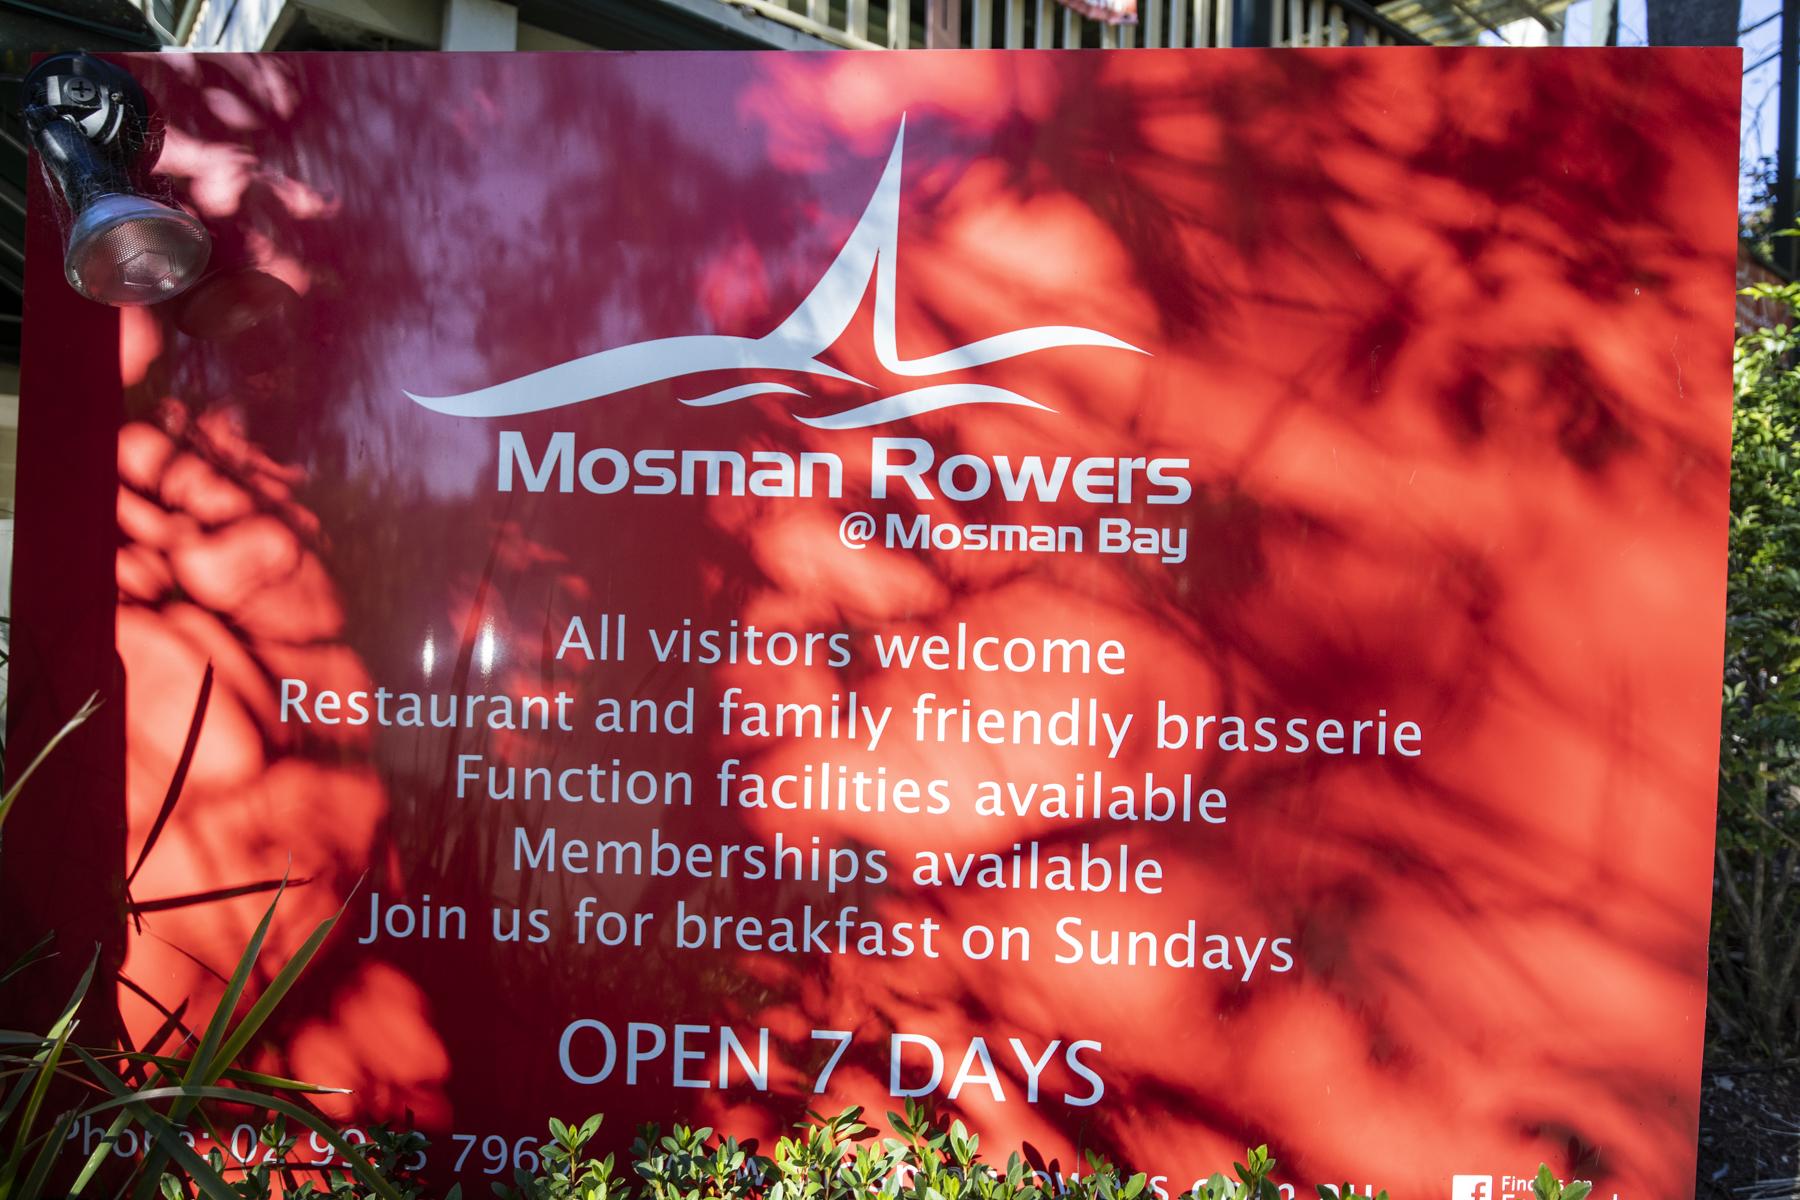 Mosman_Rowers_gm-67.jpg